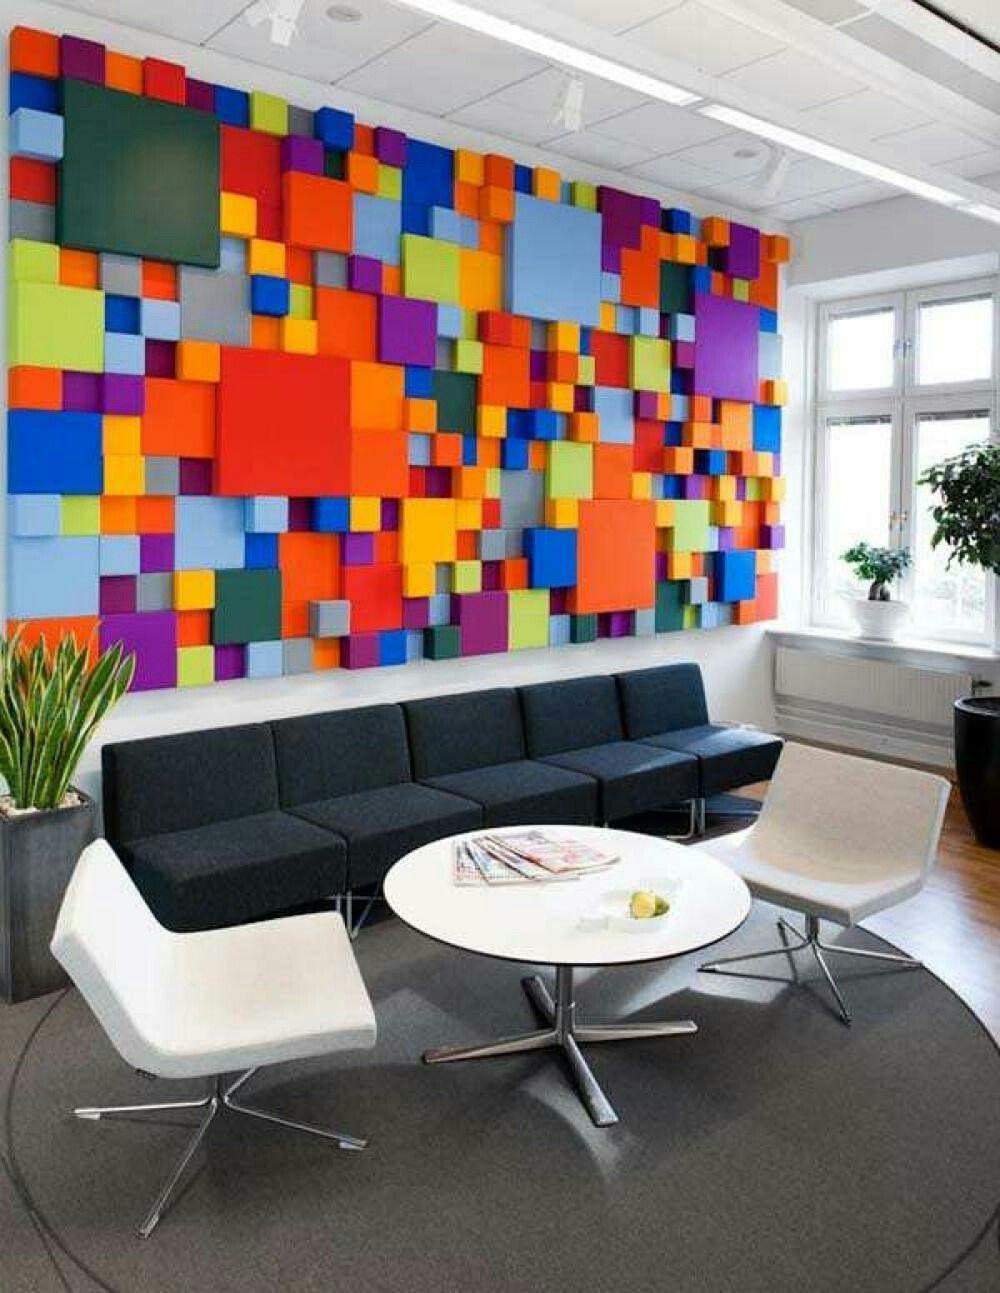 Moderne bürogestaltung  Pin von Кристина Данувас auf Colorful | Pinterest